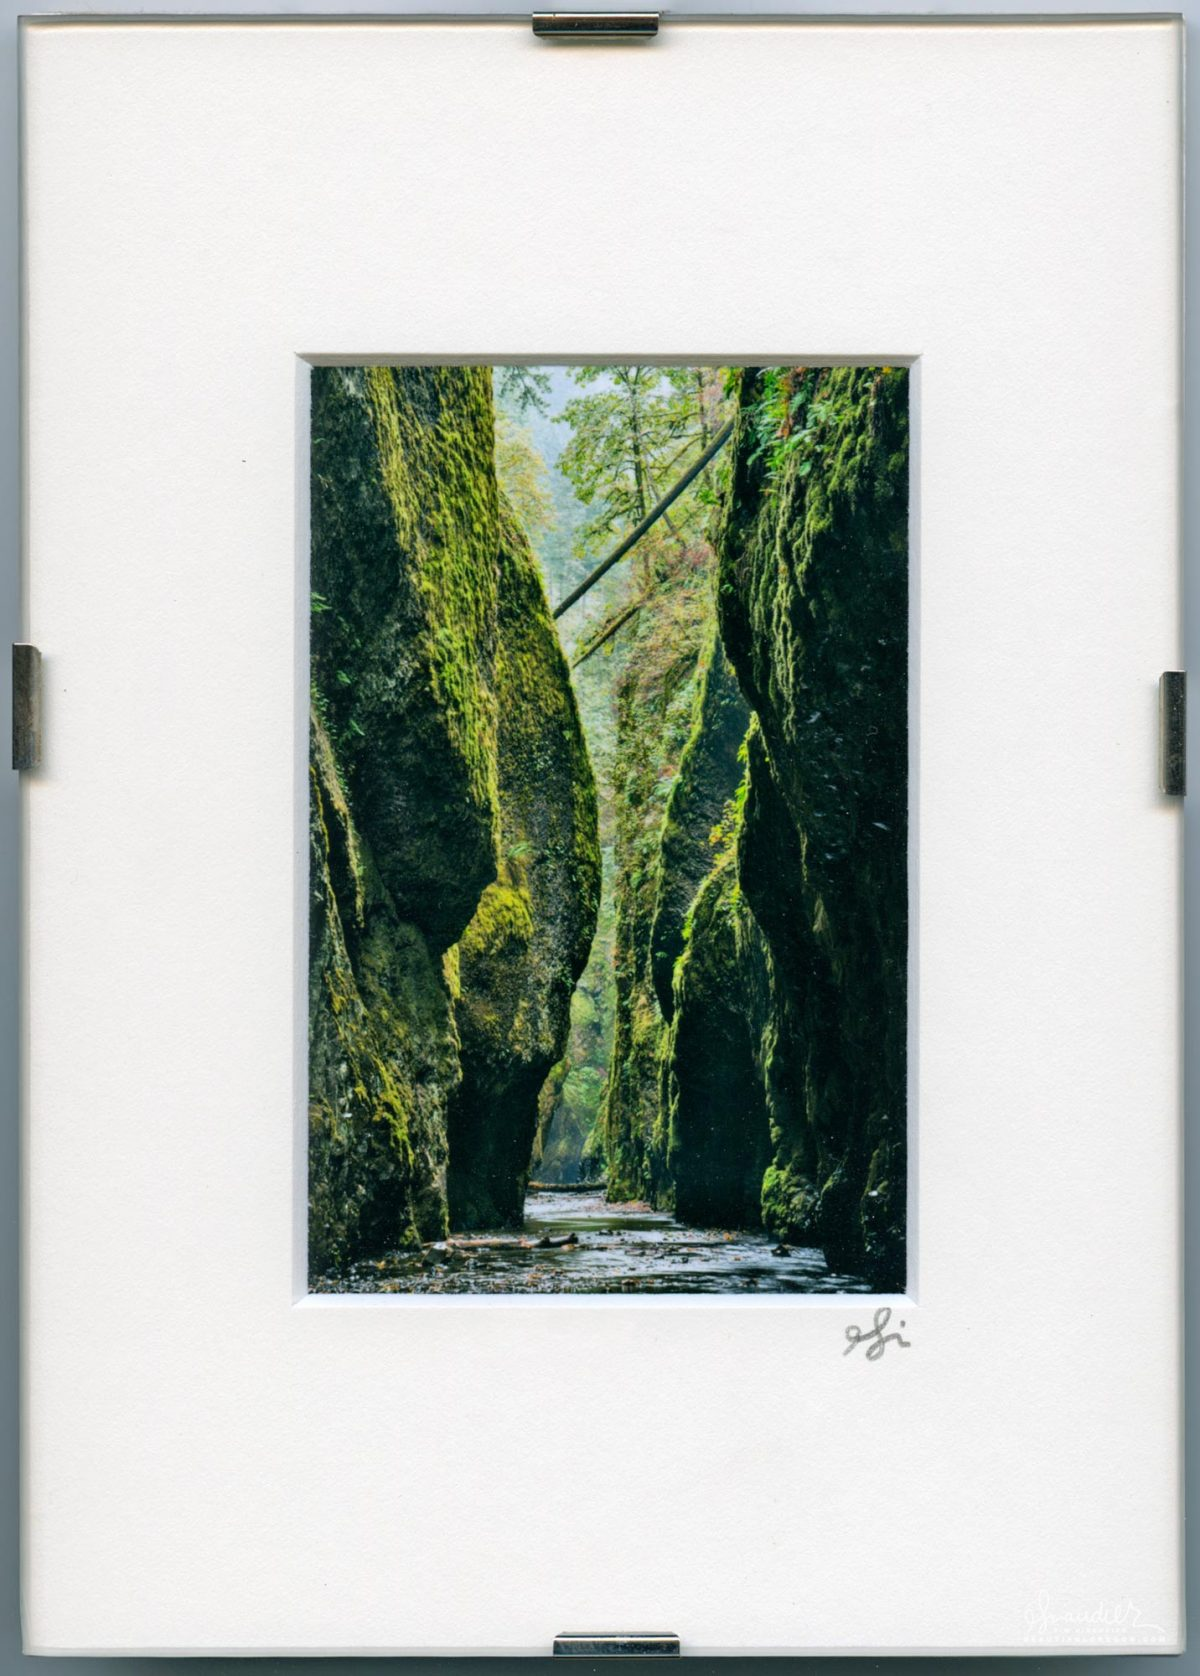 Oneonta Gorge. Mount Hood National Forest, Oregon Cascades.